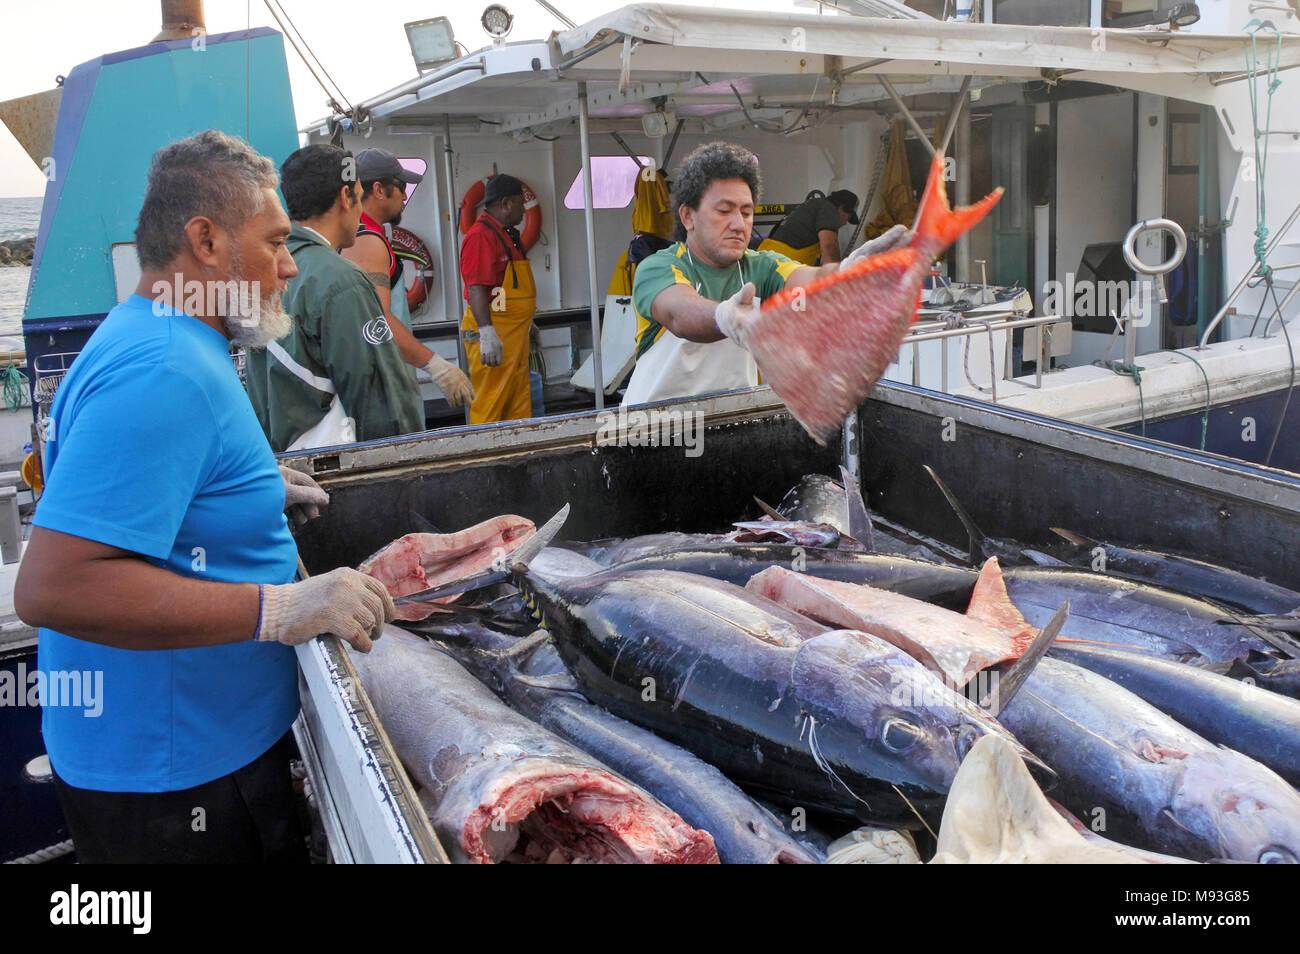 RAROTONGA - DEC 12 2017:Cook Islanders fishermen unloading their catch in Ports of Avatiu. Cook Islands exclusive economic zone territorial waters str - Stock Image